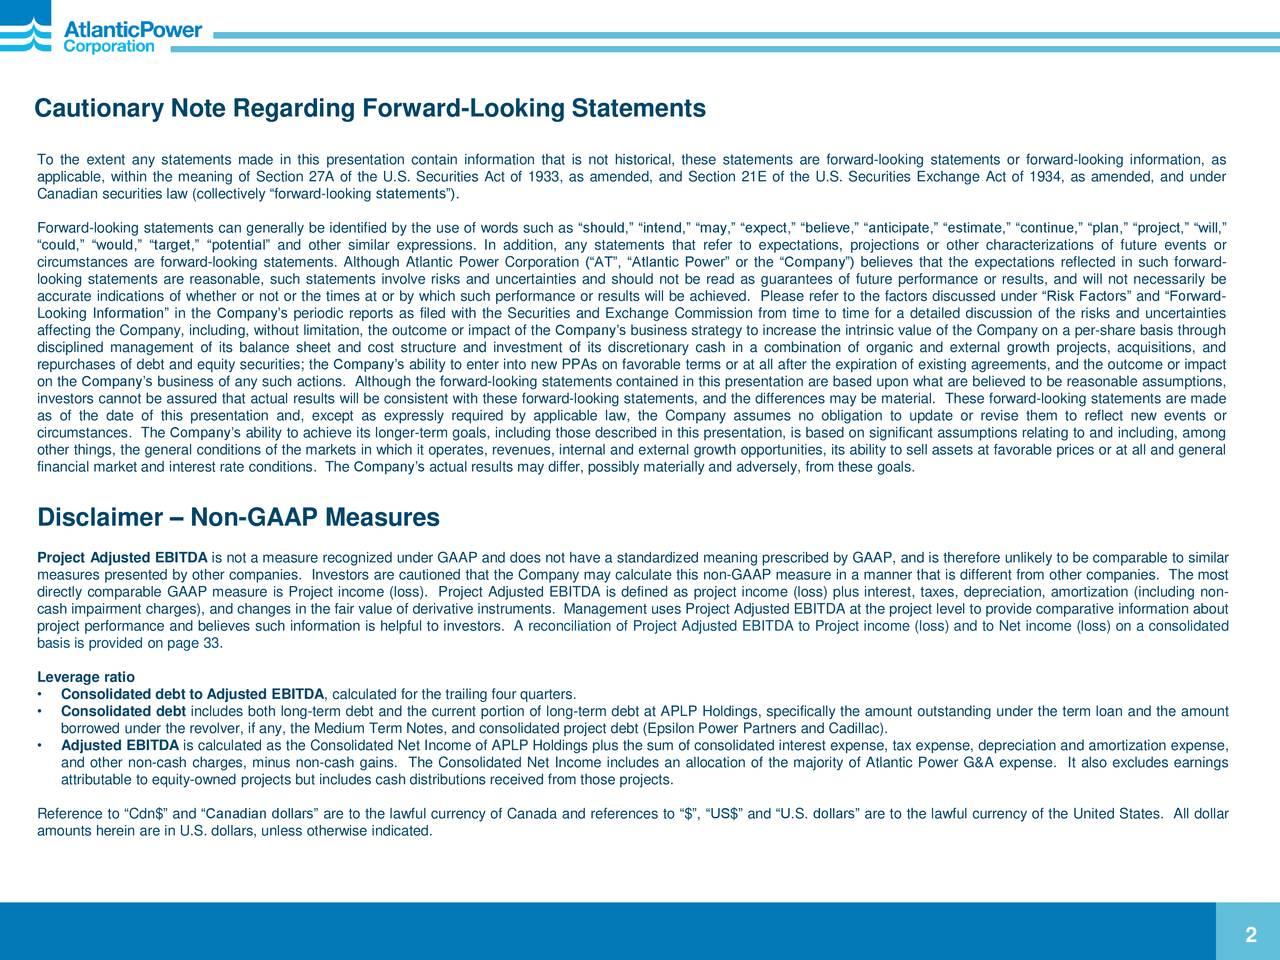 Cautionary Note Regarding Forward-Looking Statements